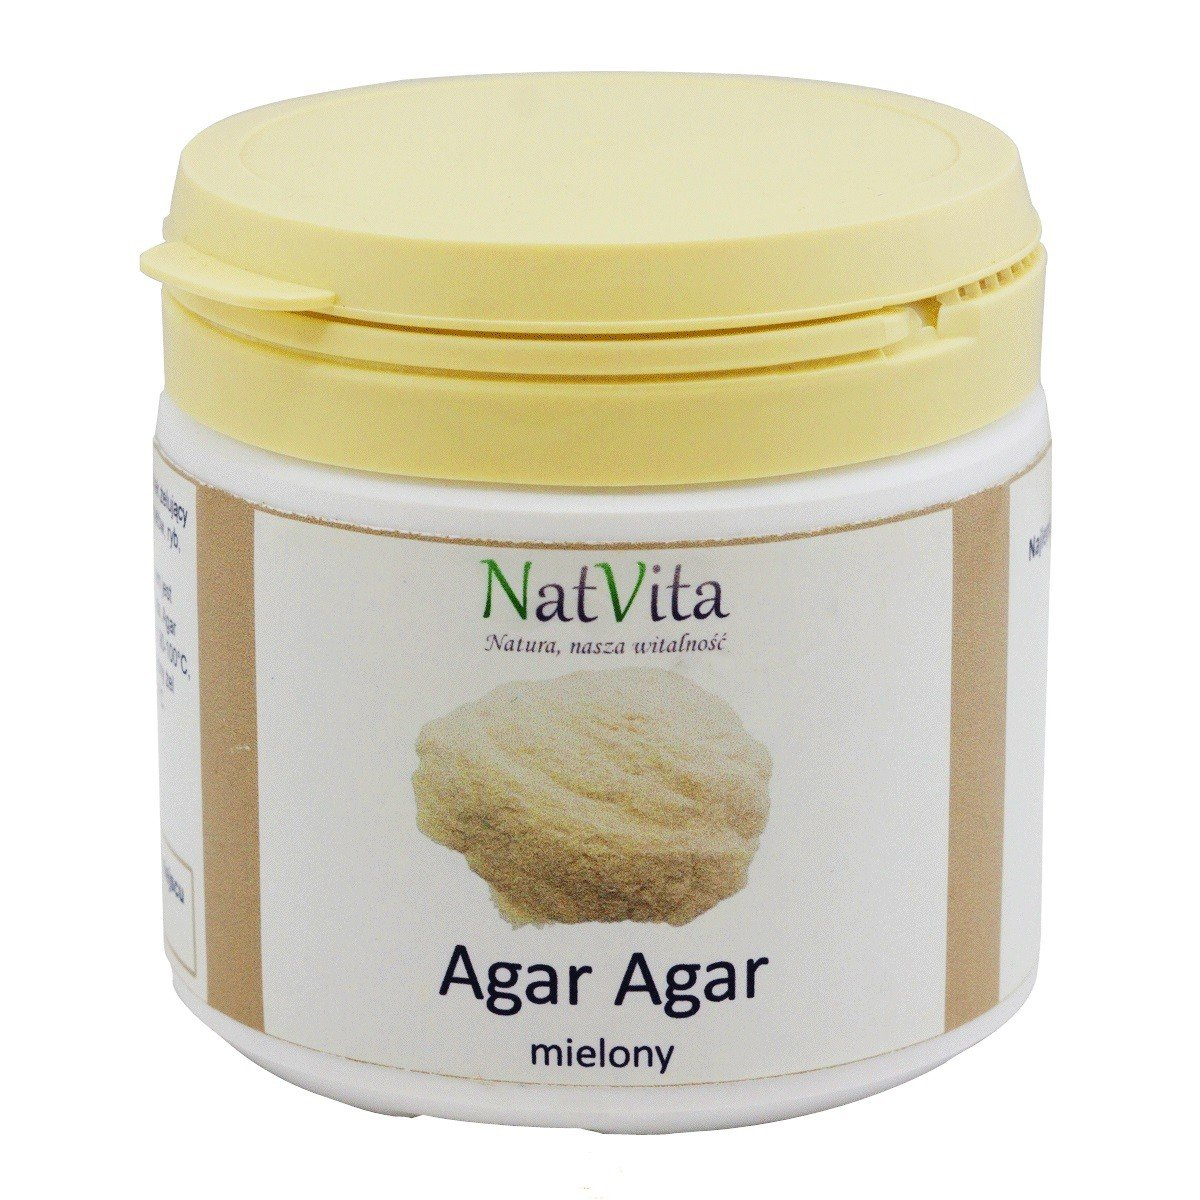 Agar Agar 100g, naturalny środek żelujący